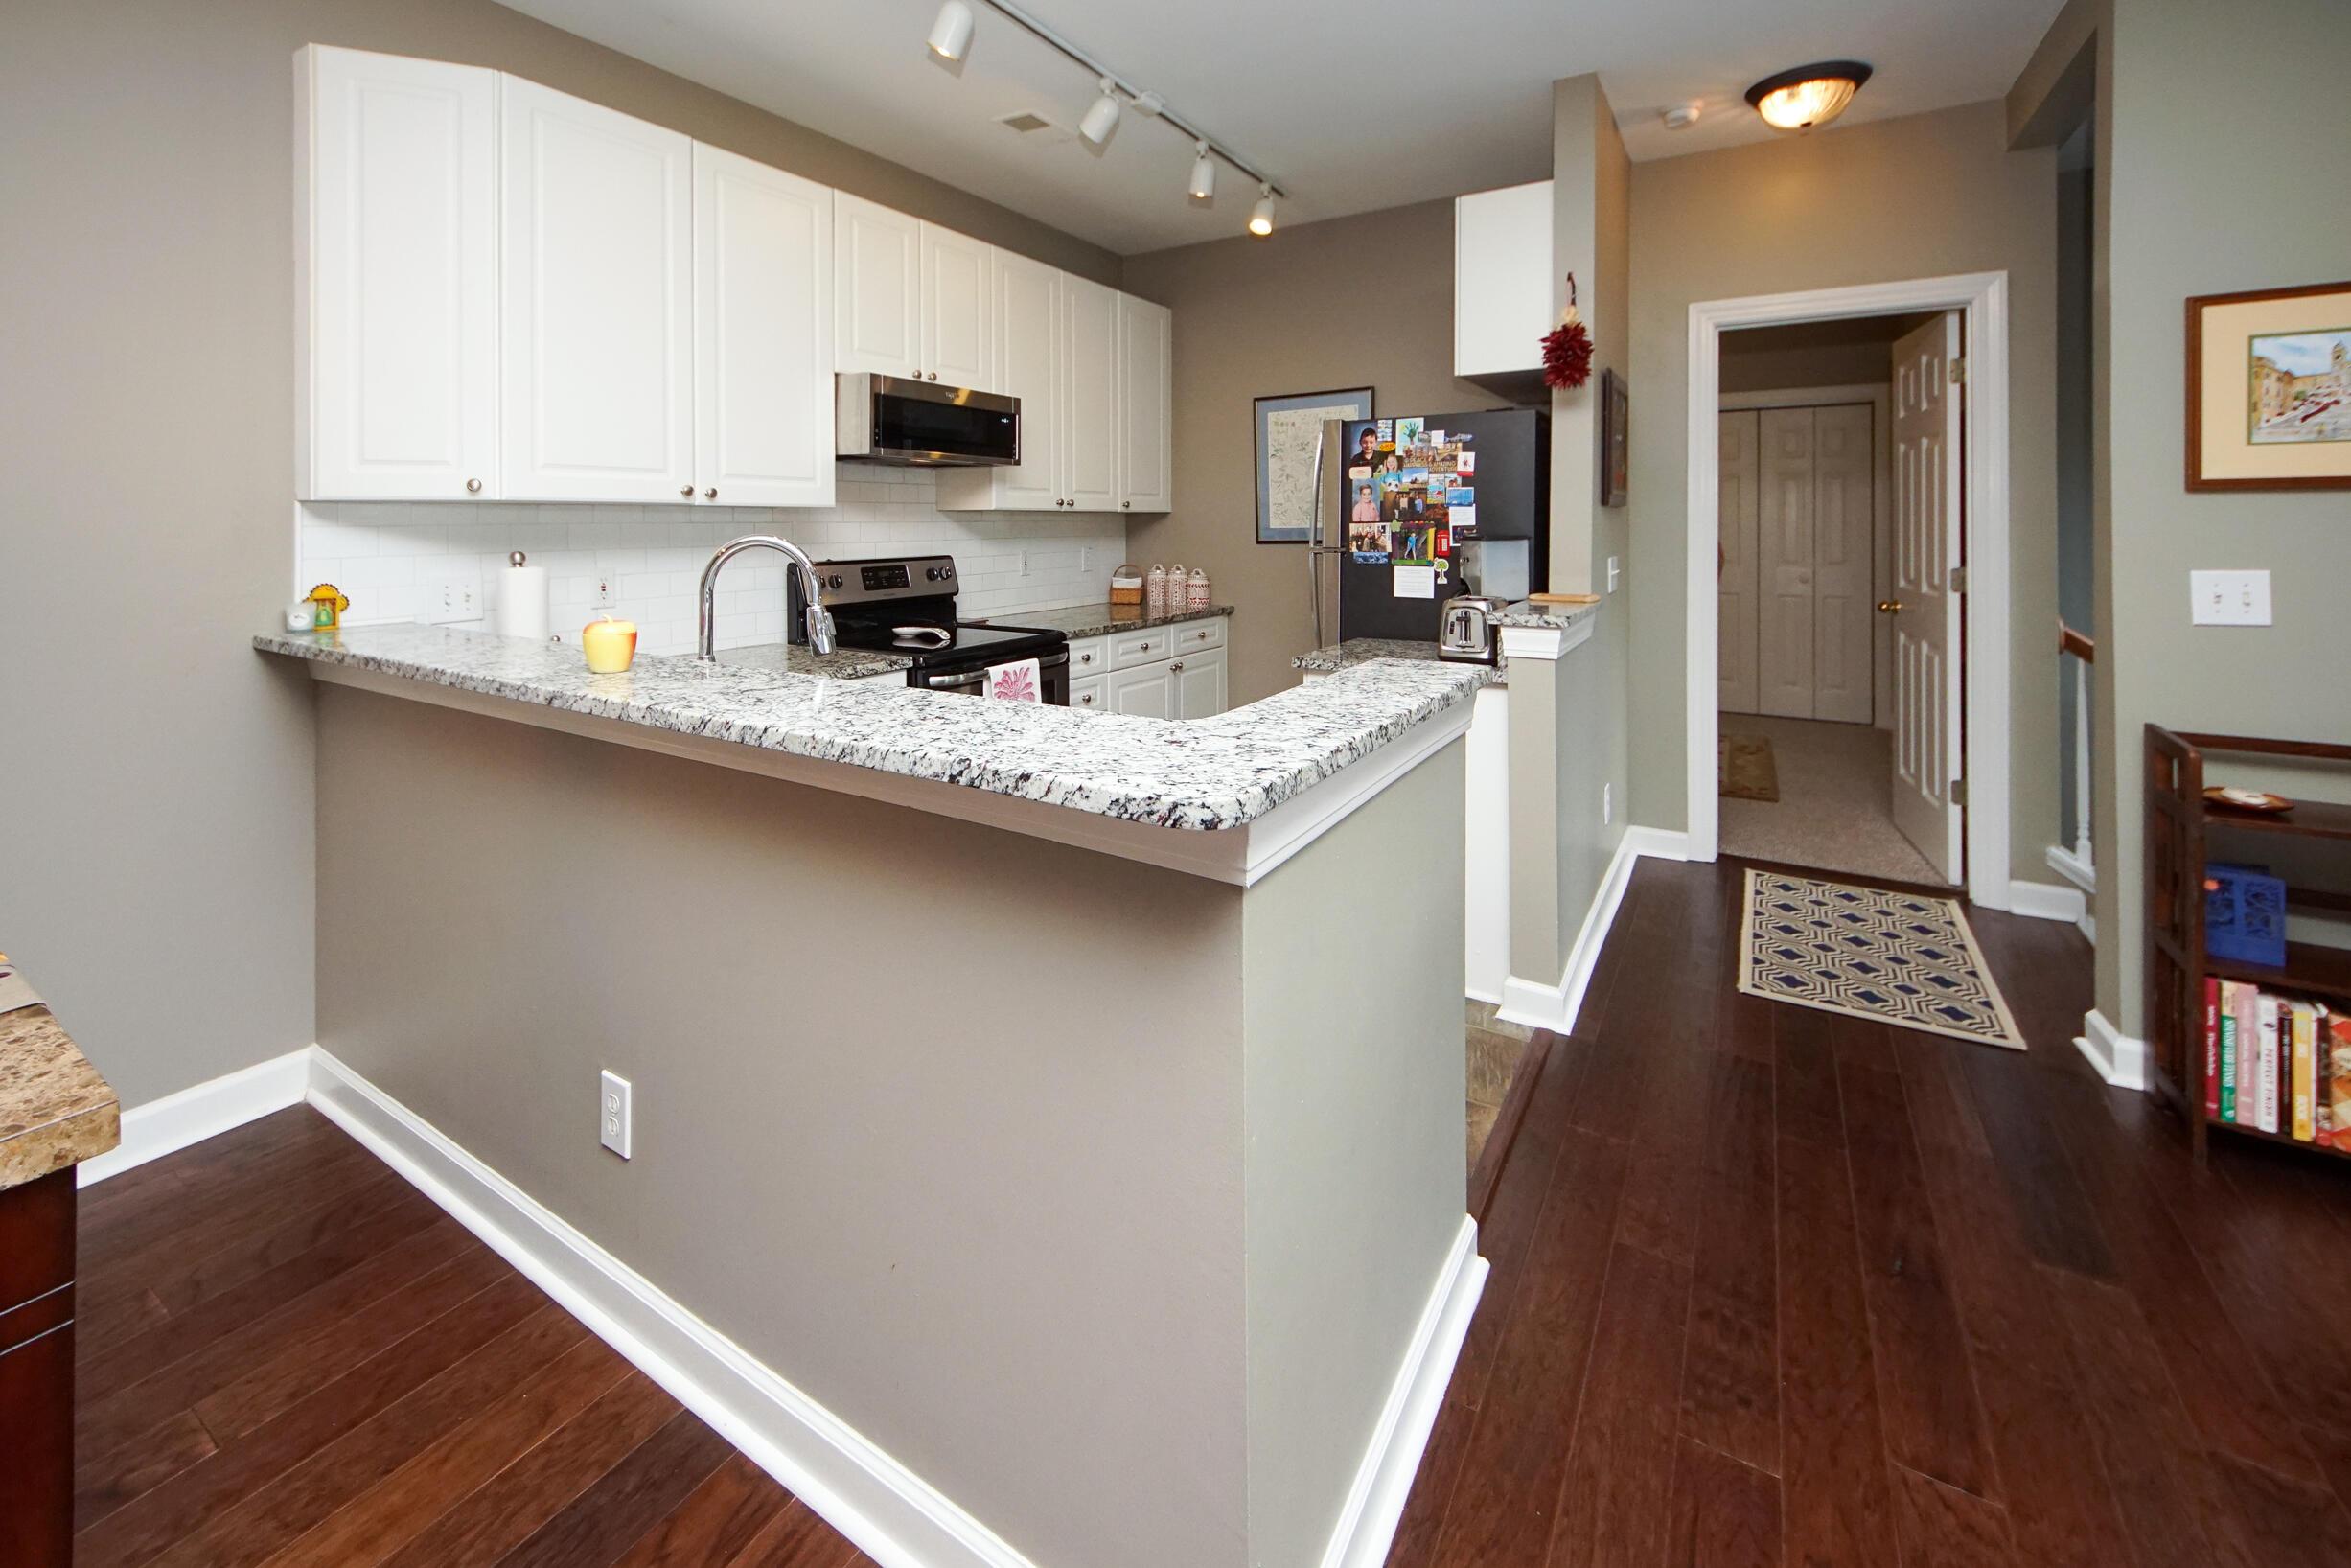 Dunes West Homes For Sale - 1631 Camfield, Mount Pleasant, SC - 0